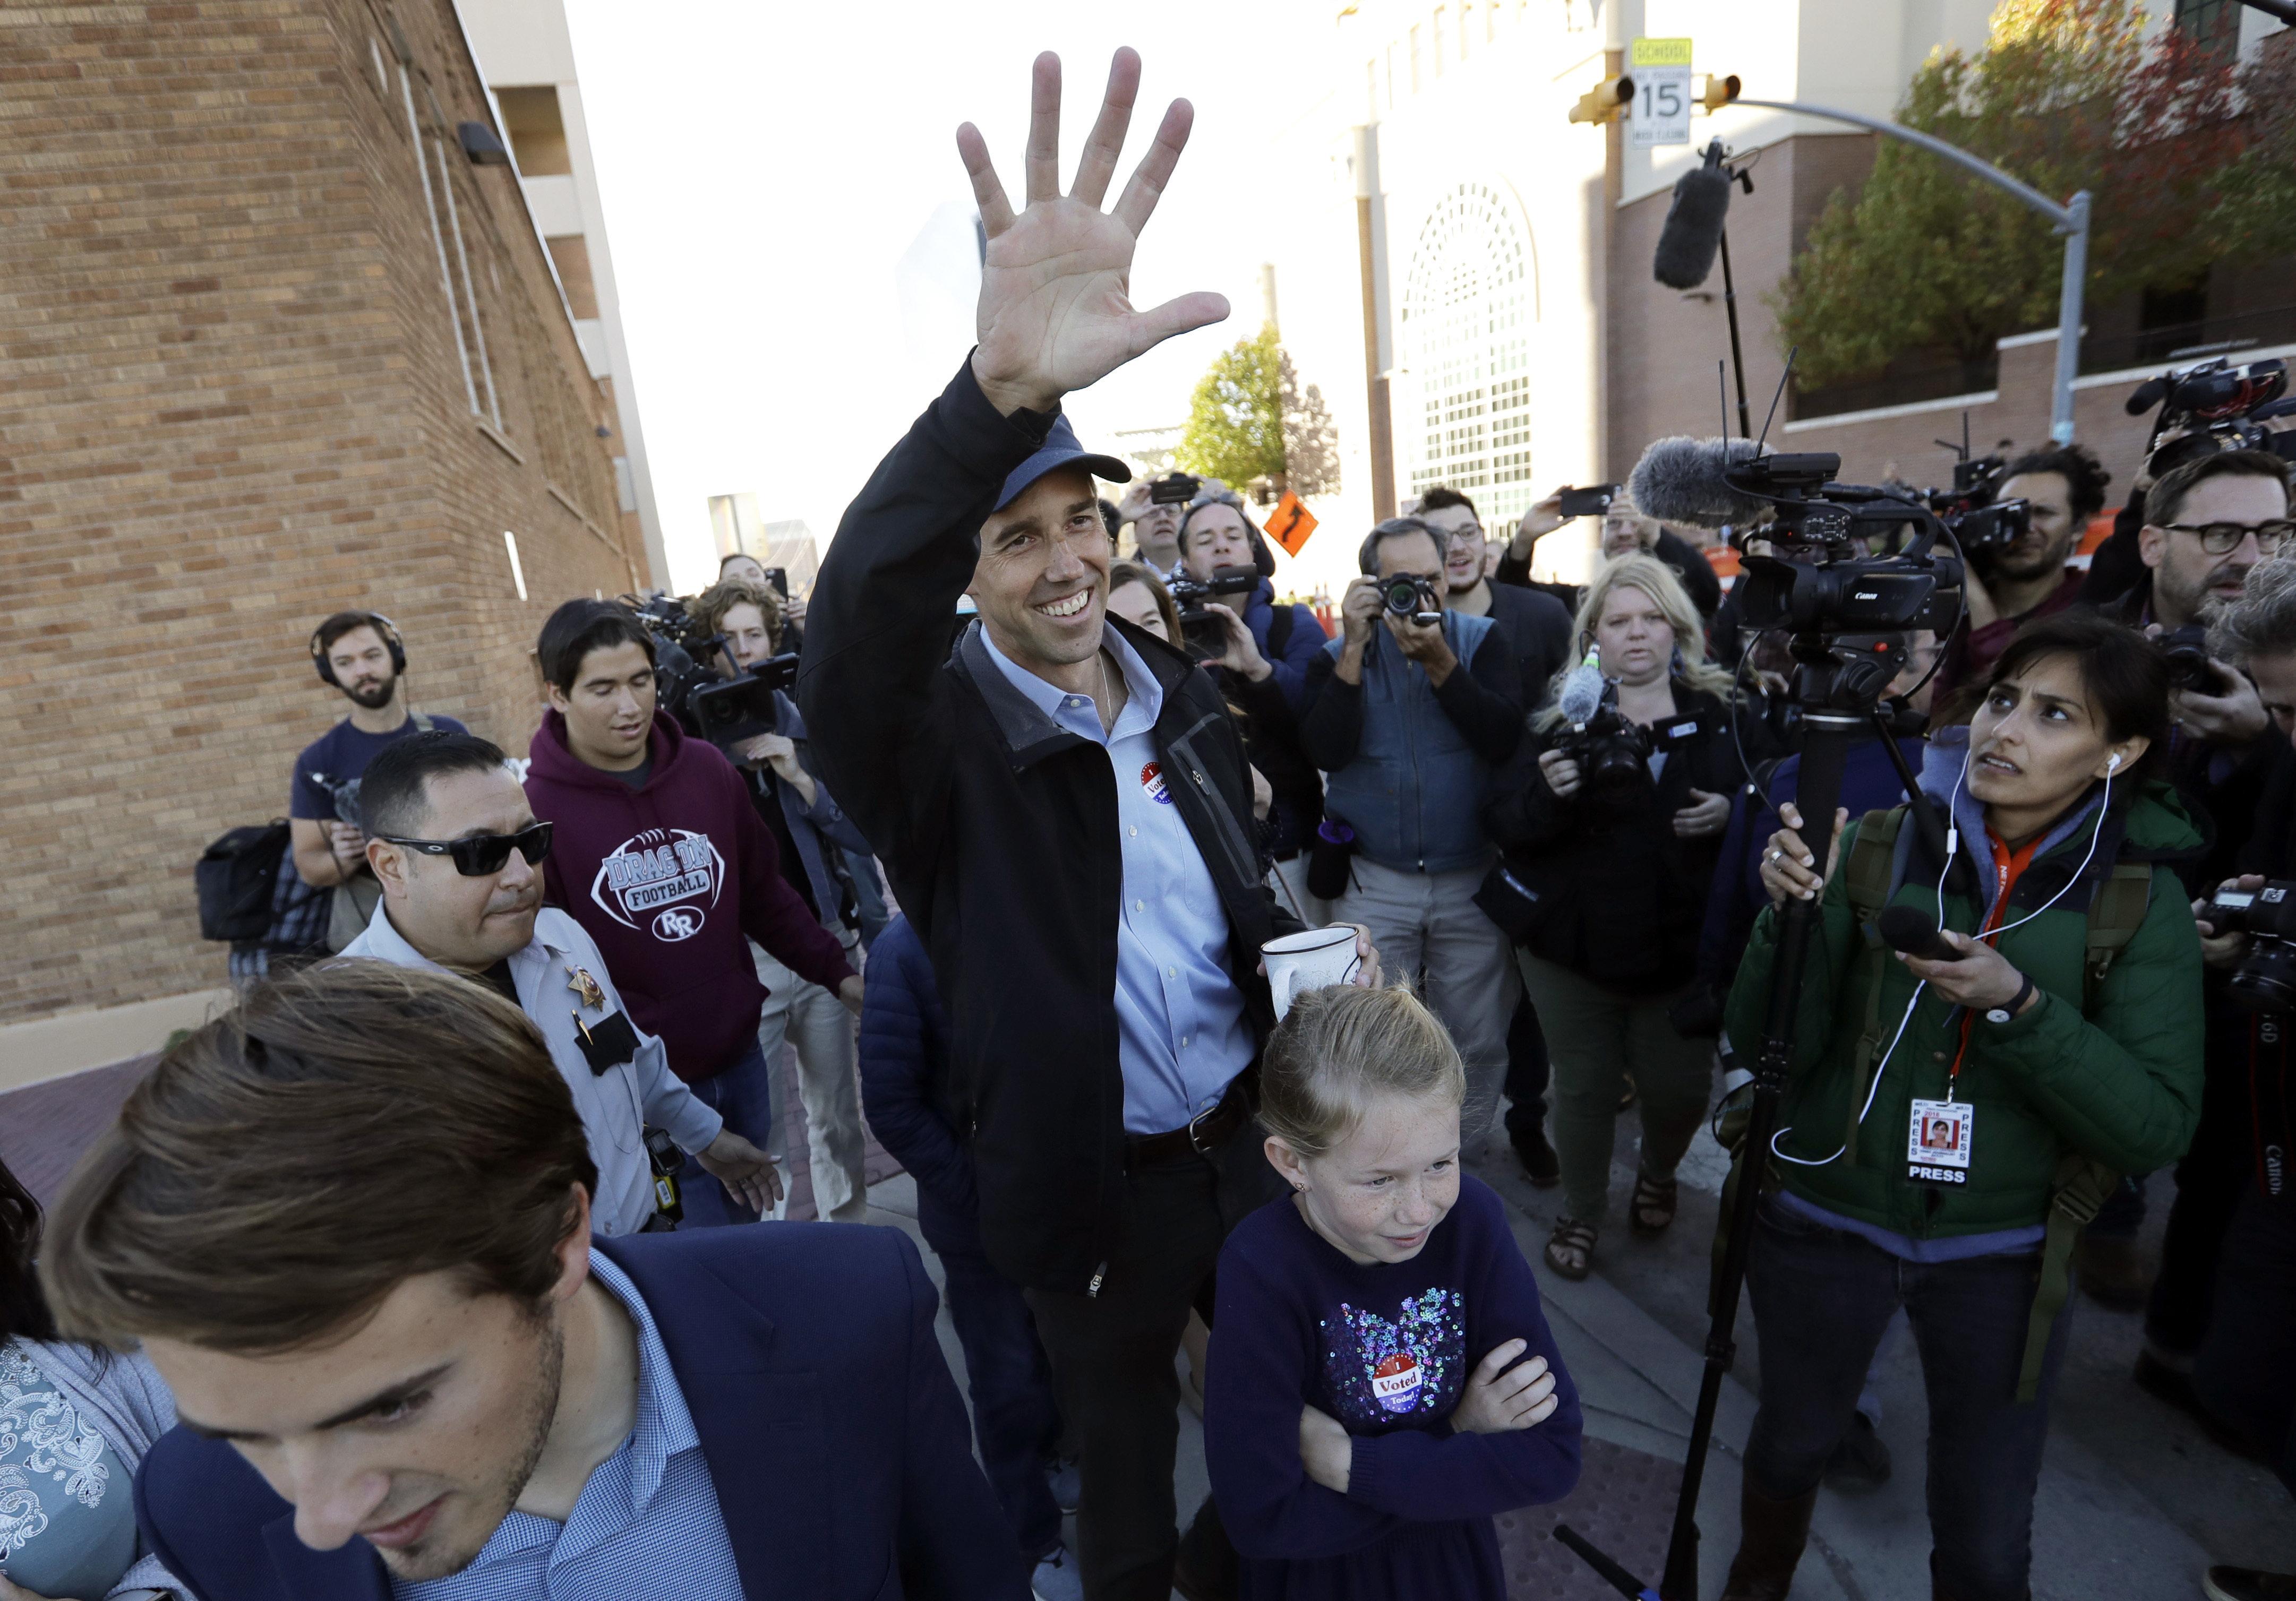 Democrat Beto O'Rourke lost his quixotic bid to unseat GOP Sen. Ted Cruz in Texas. But O'Rourke's run left his party in a far